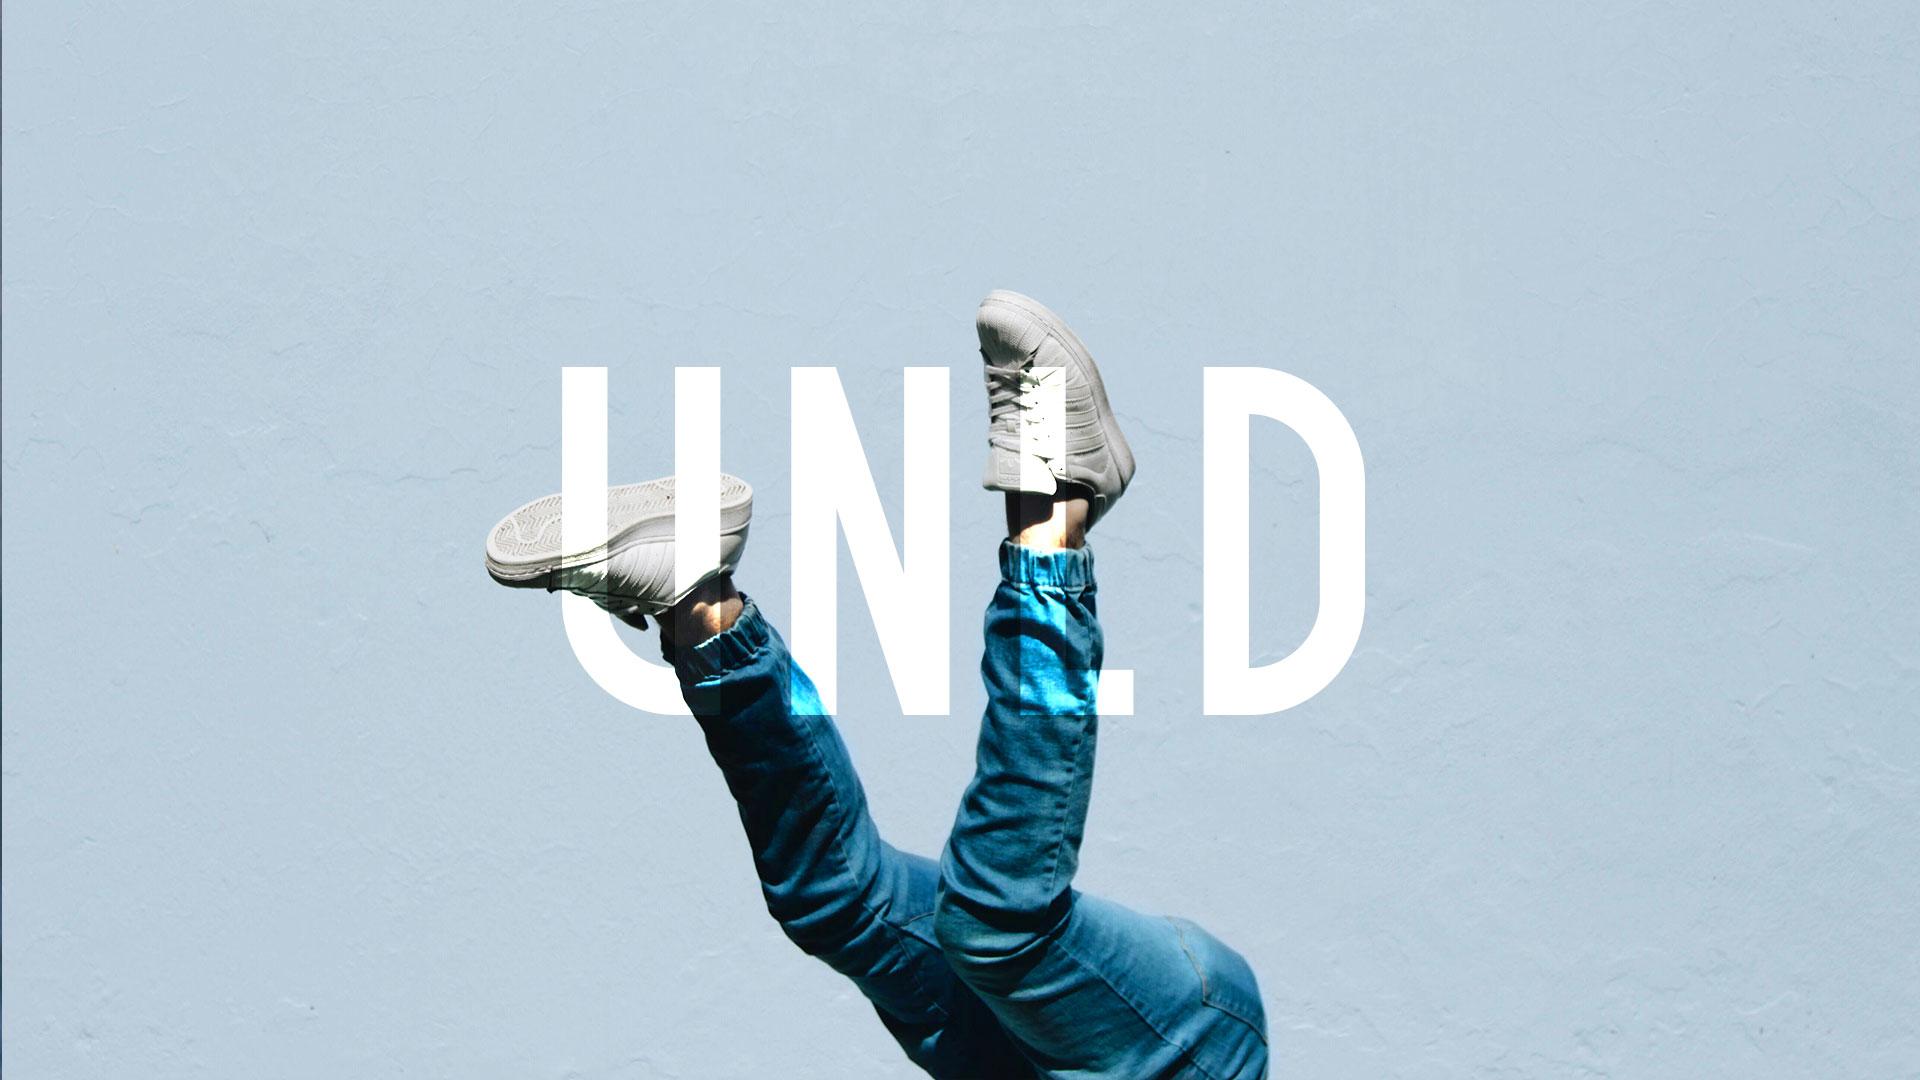 FOTOS-Tira-Undeland10